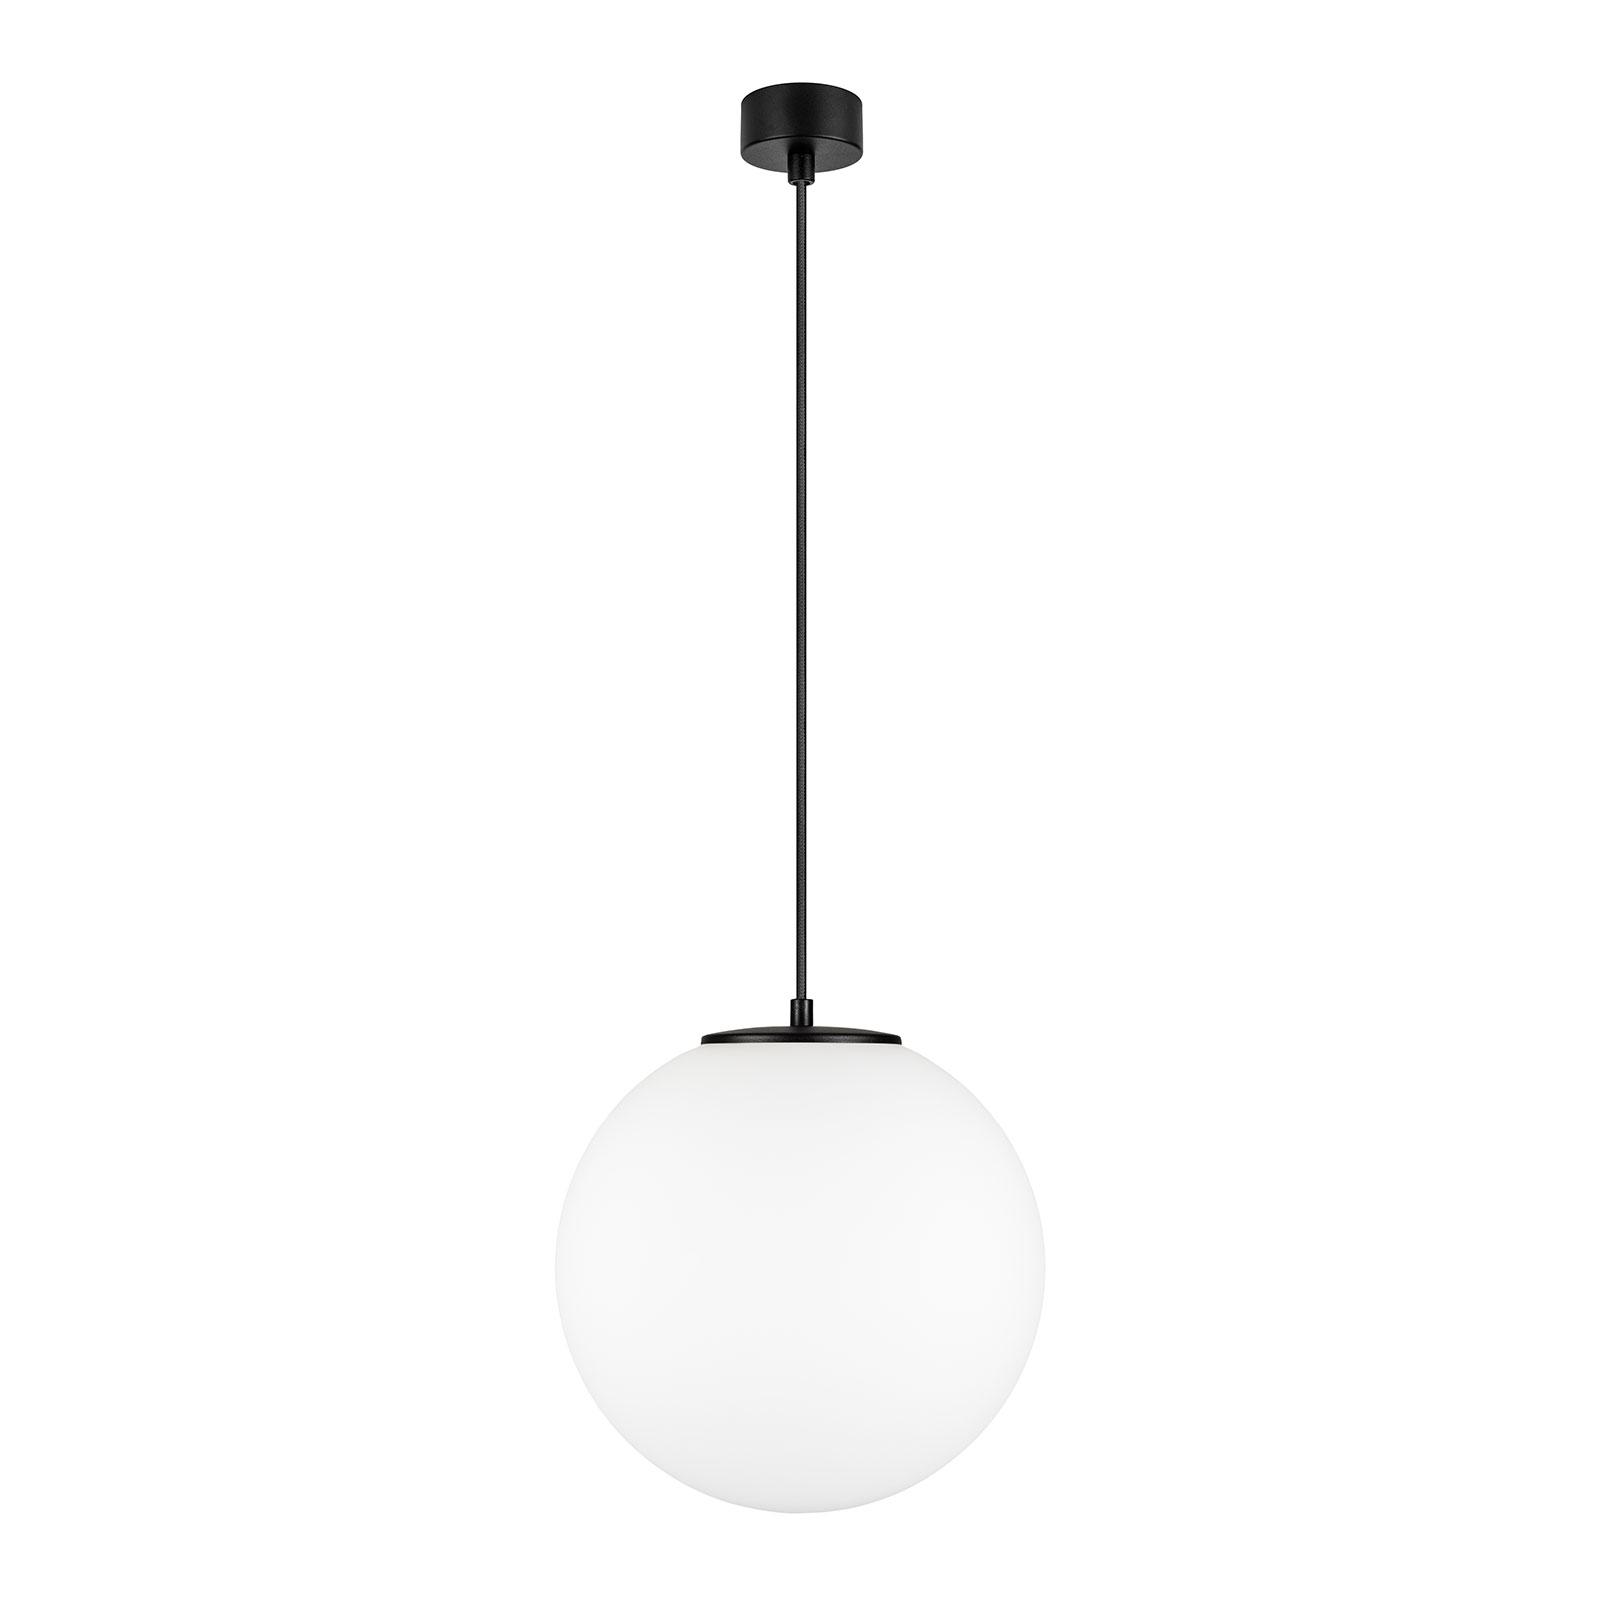 Tsuki L hengelampe, 1 lyskilde, Ø 30 cm, svart